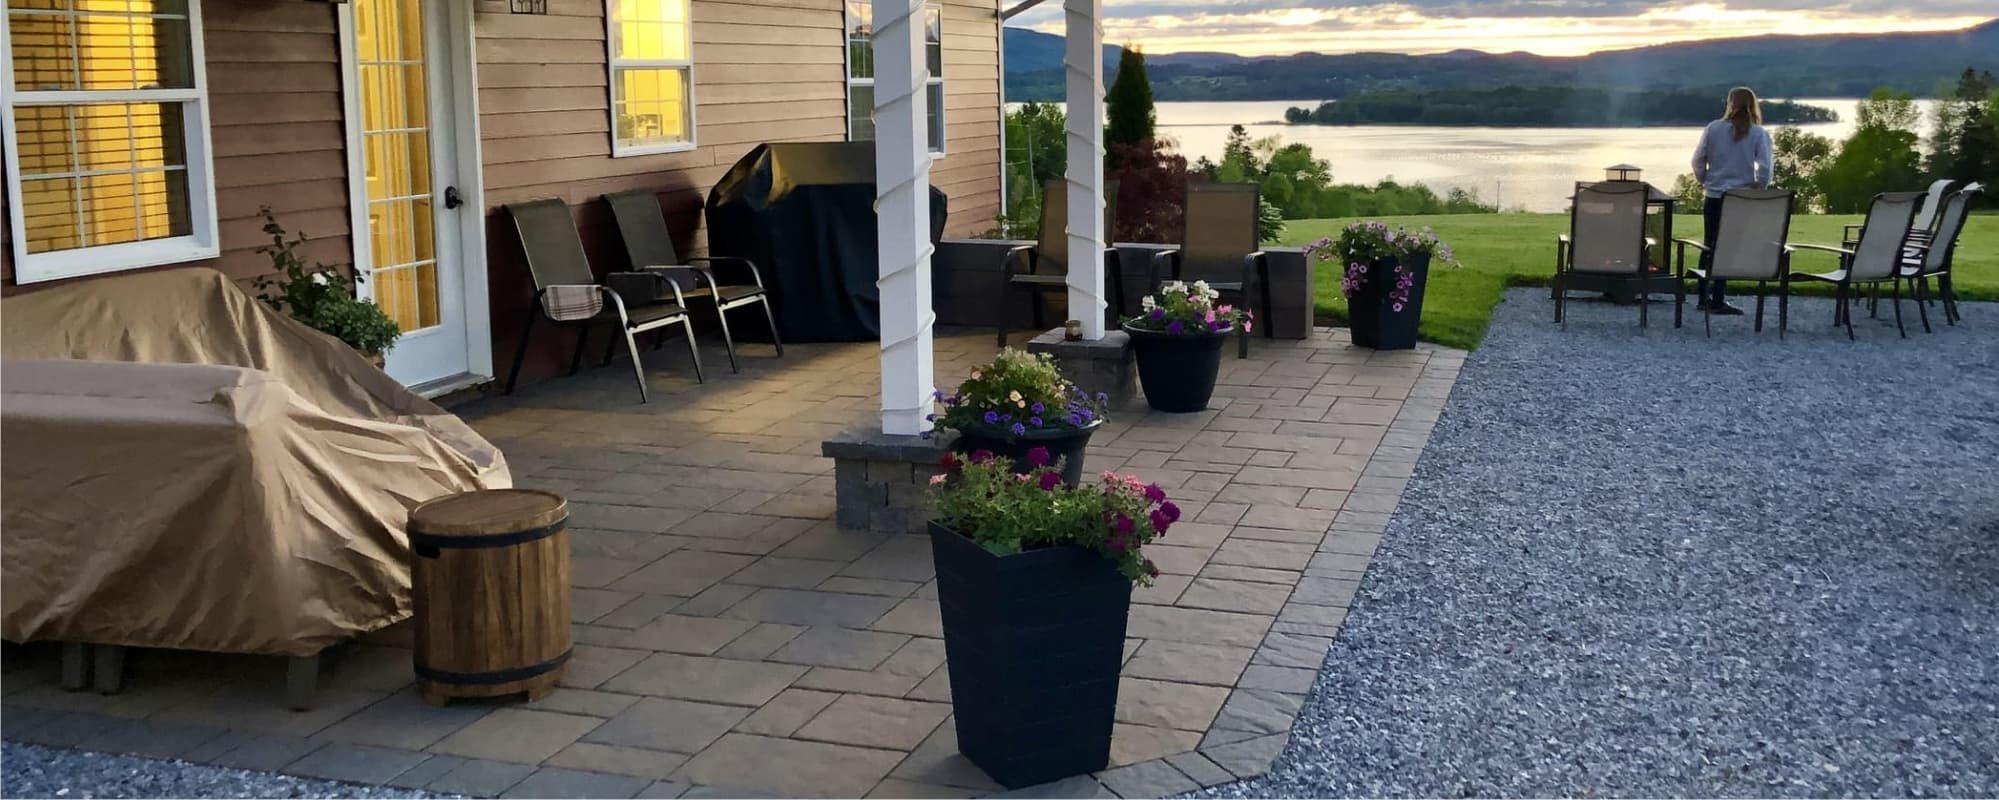 ernies landscaping hampton